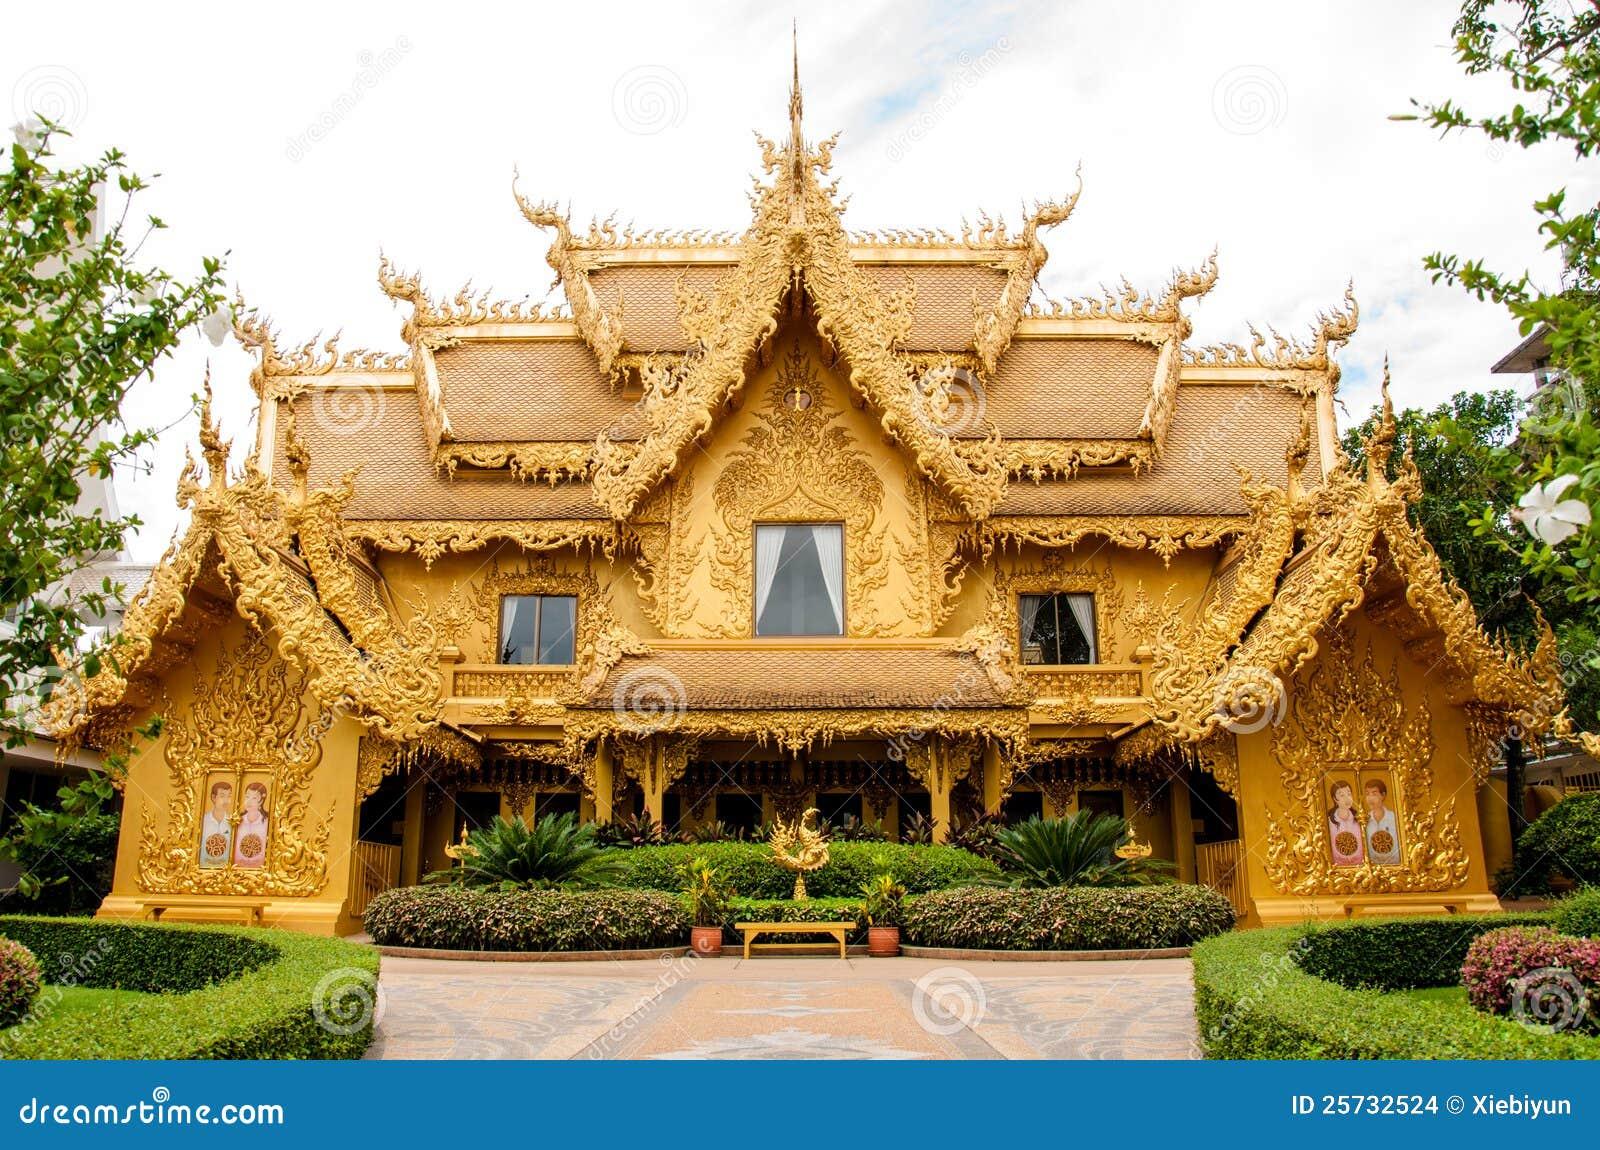 Golden building, Chiangrai, Thailand.